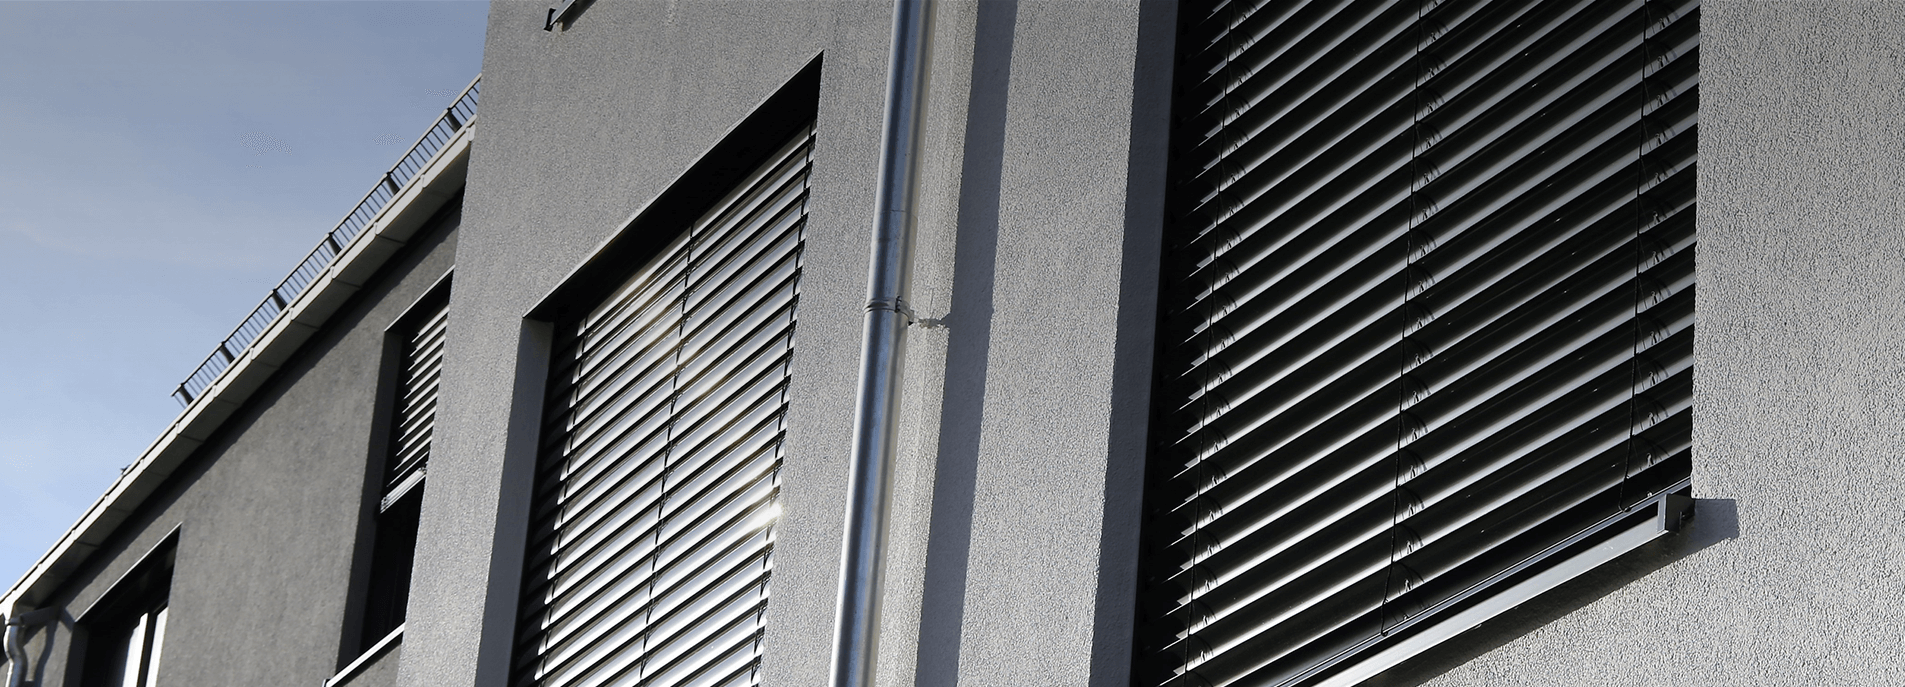 protective blinds banner bg